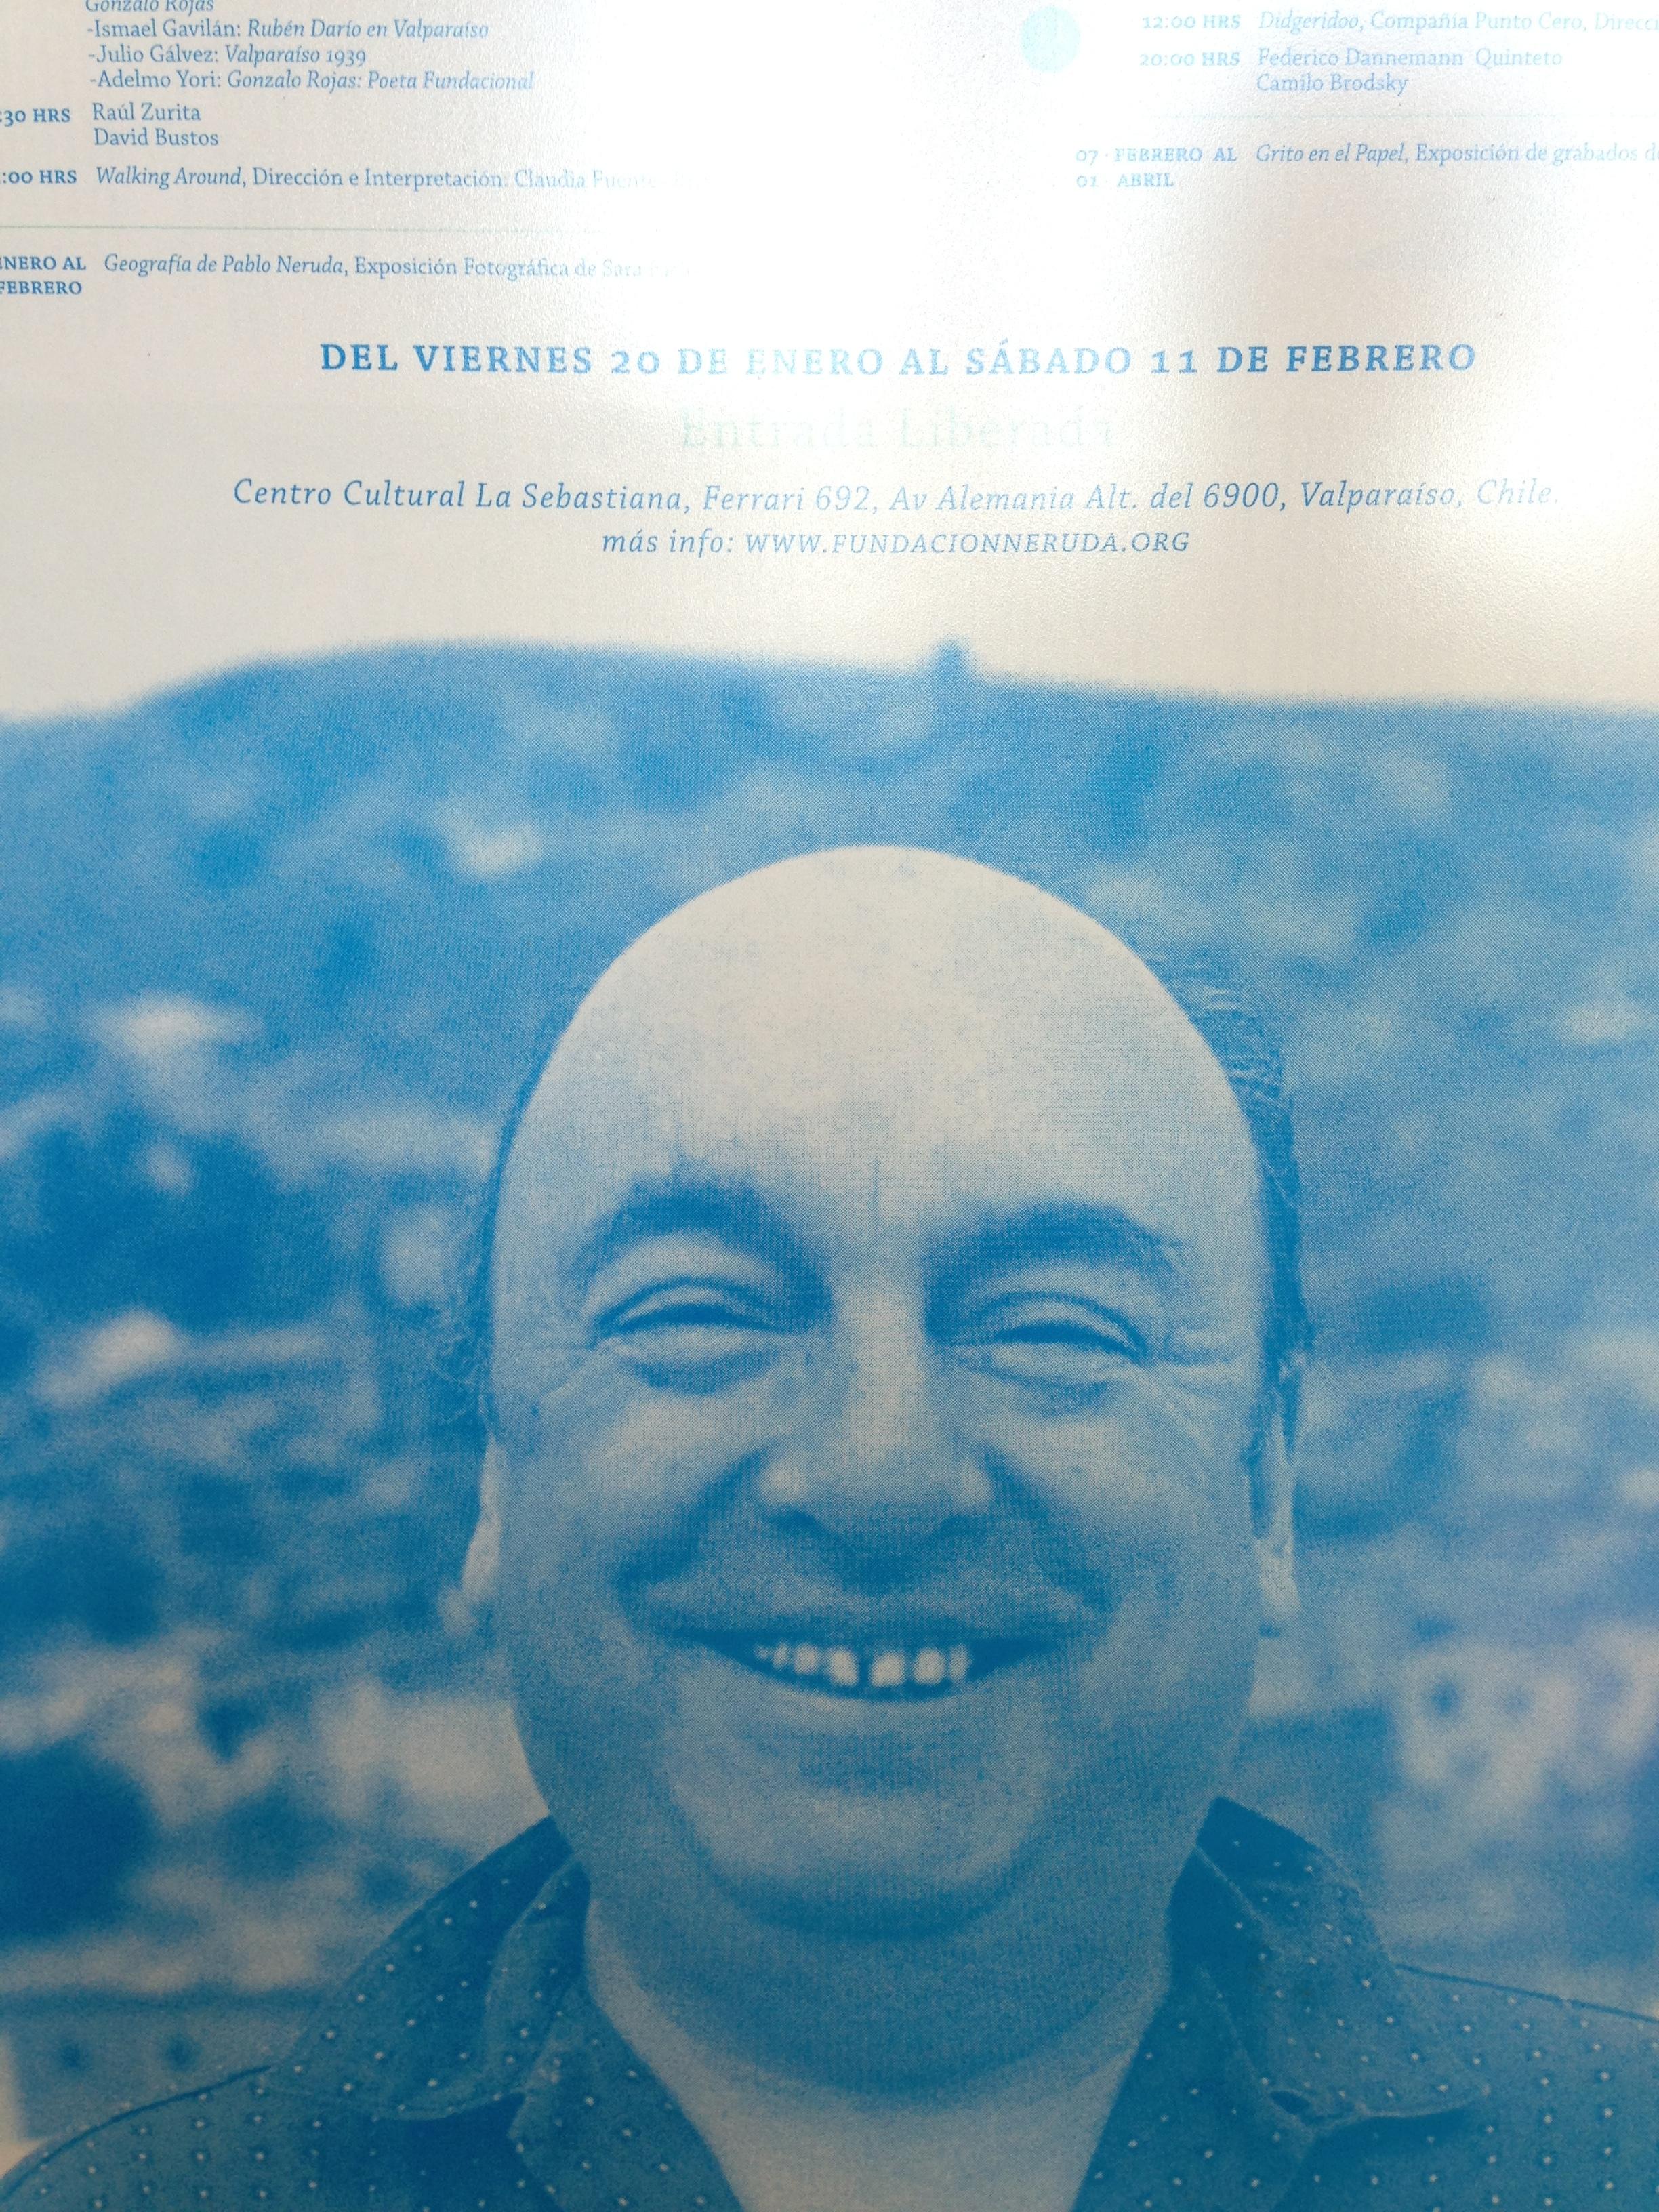 Rare photo of Pablo Neruda smiling